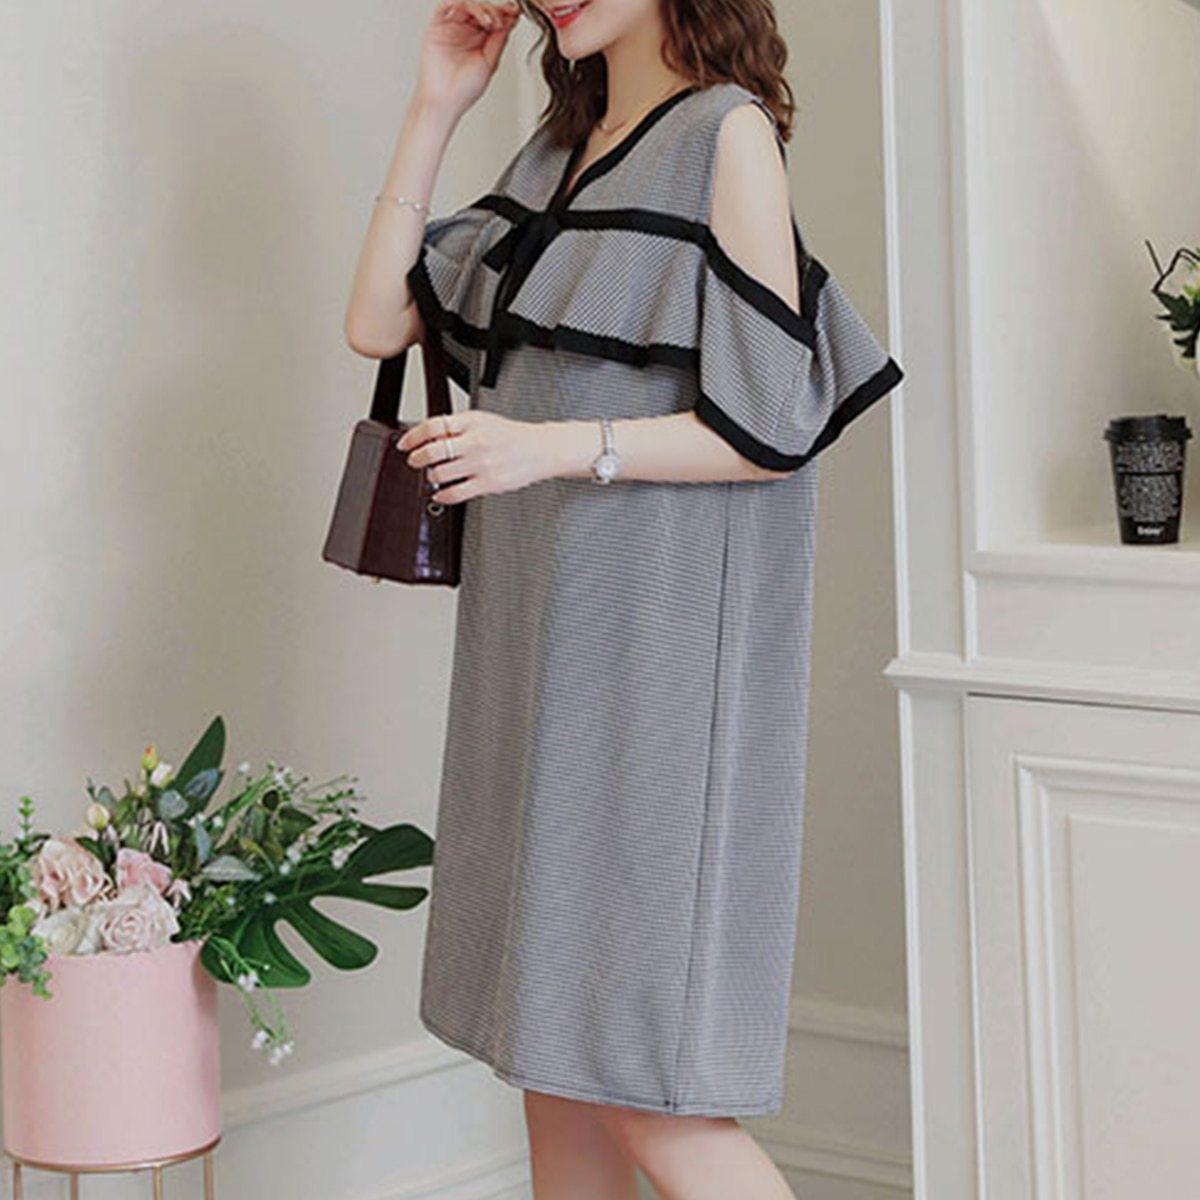 Maternity Dress Off The Shoulder Plaid Ruffles V-Neck Straight Dress image 3